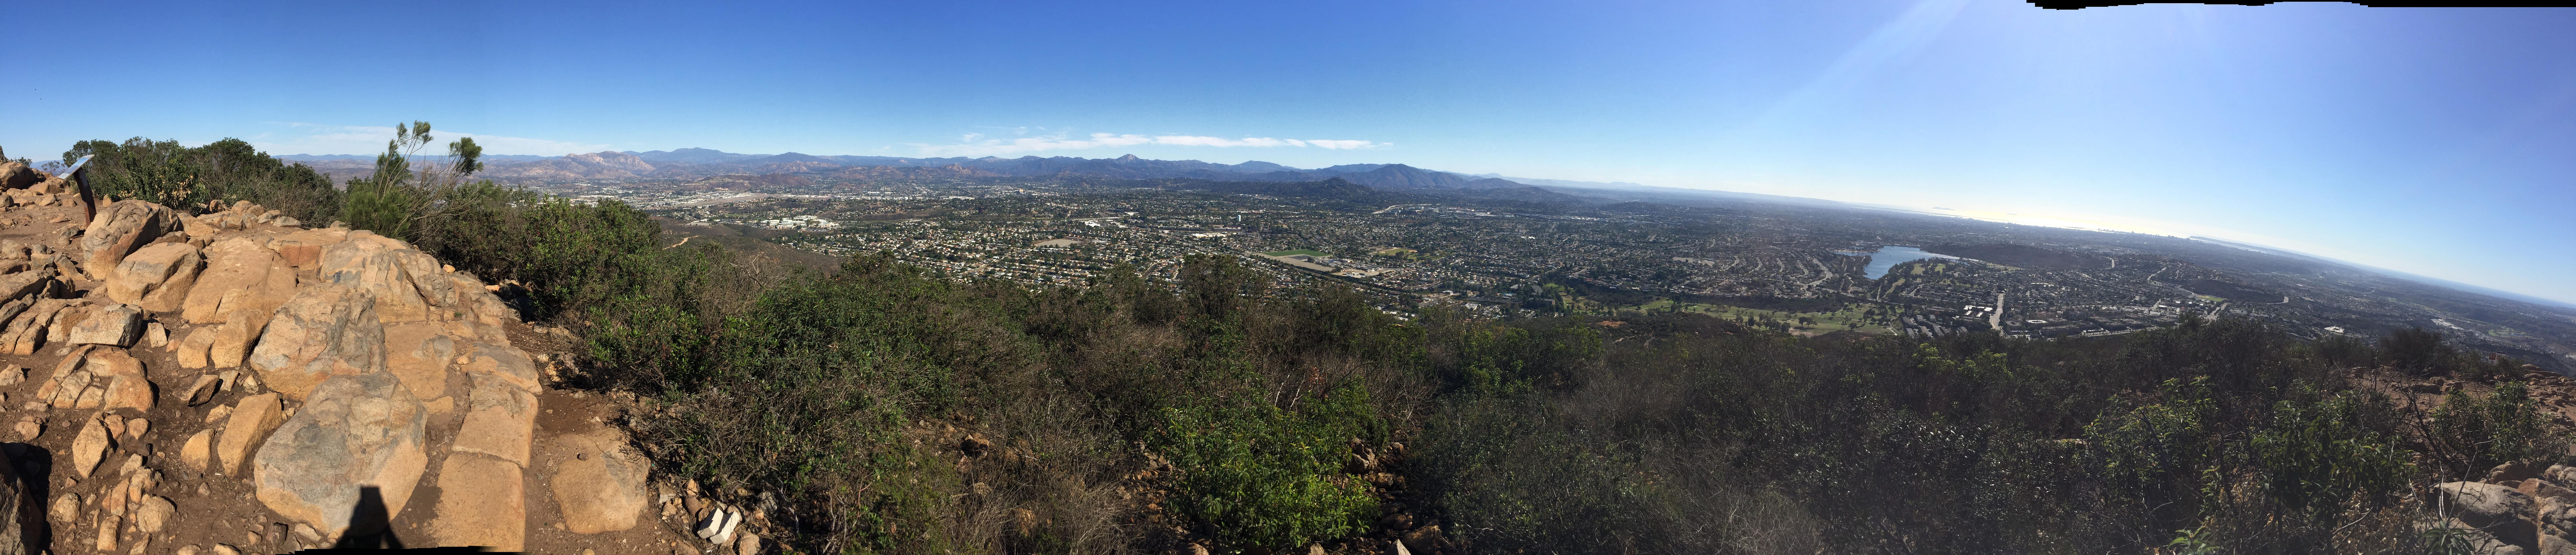 Cowles Mountain, CA